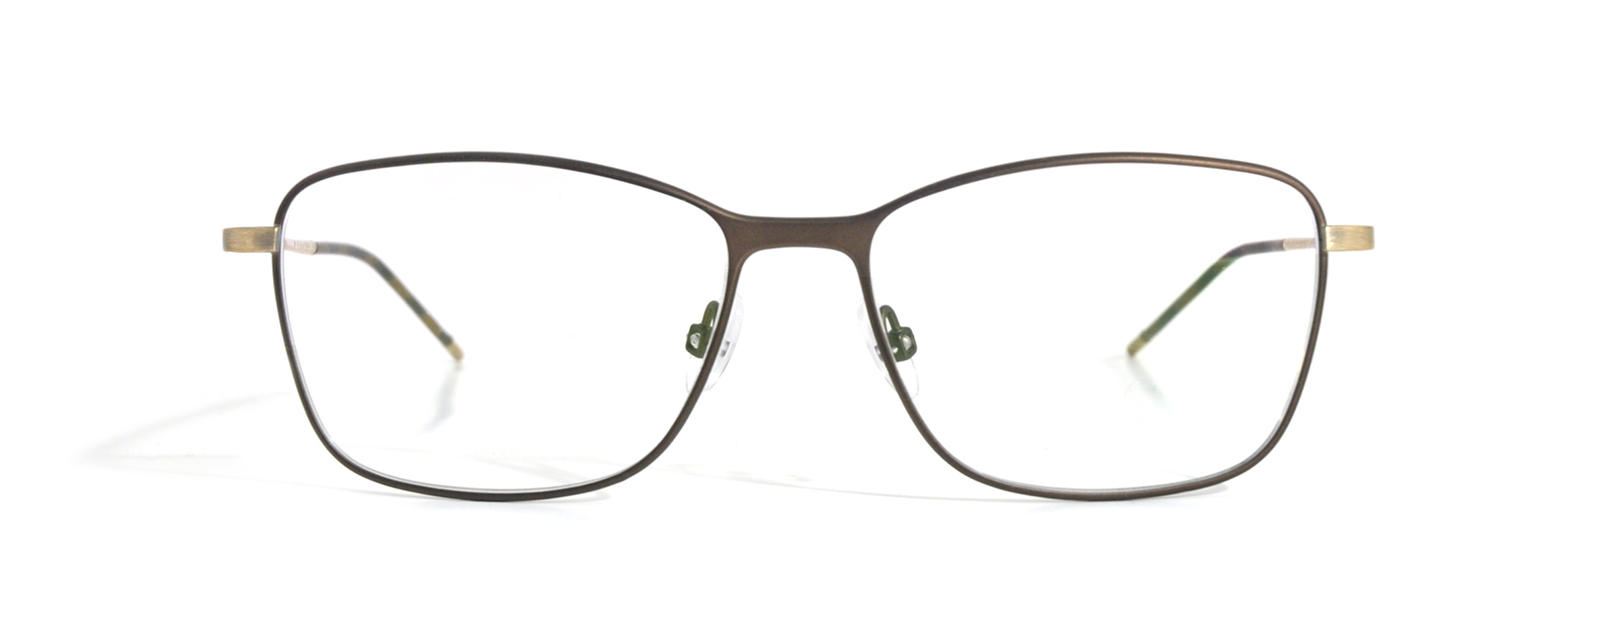 Götti Titan Brille München